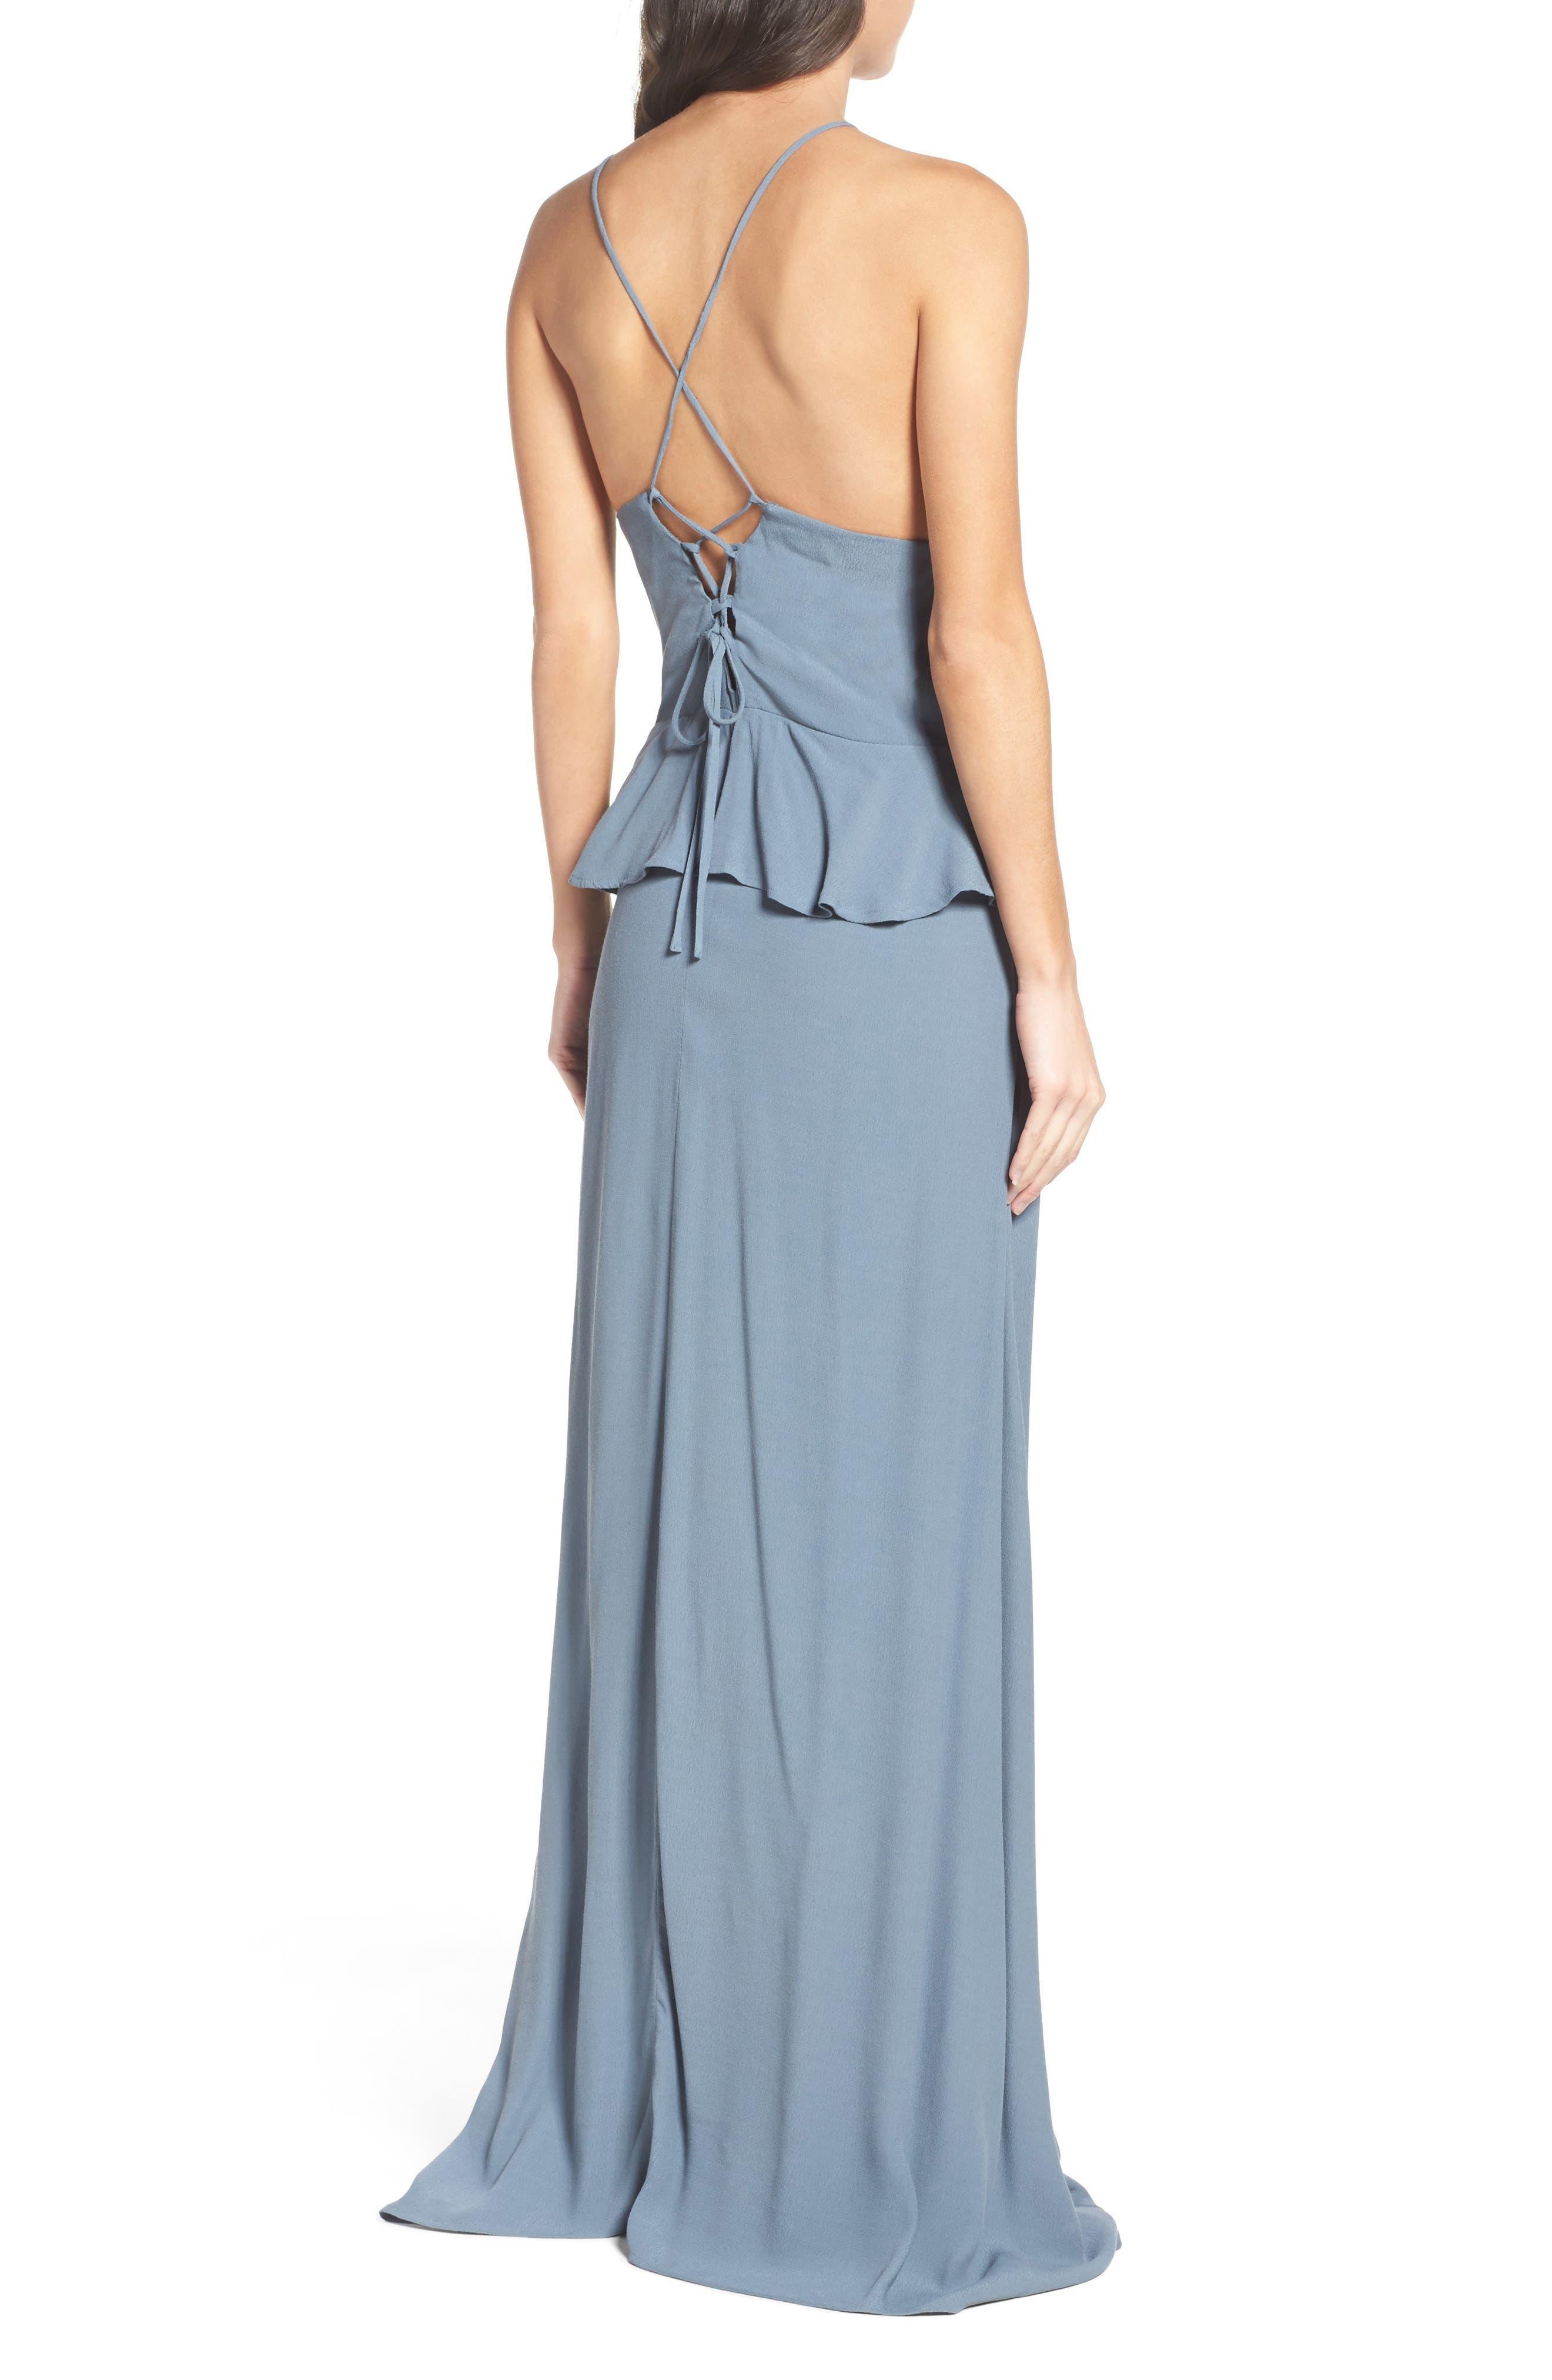 Roe + May Jolie Crepe Peplum Dress,                             Alternate thumbnail 4, color,